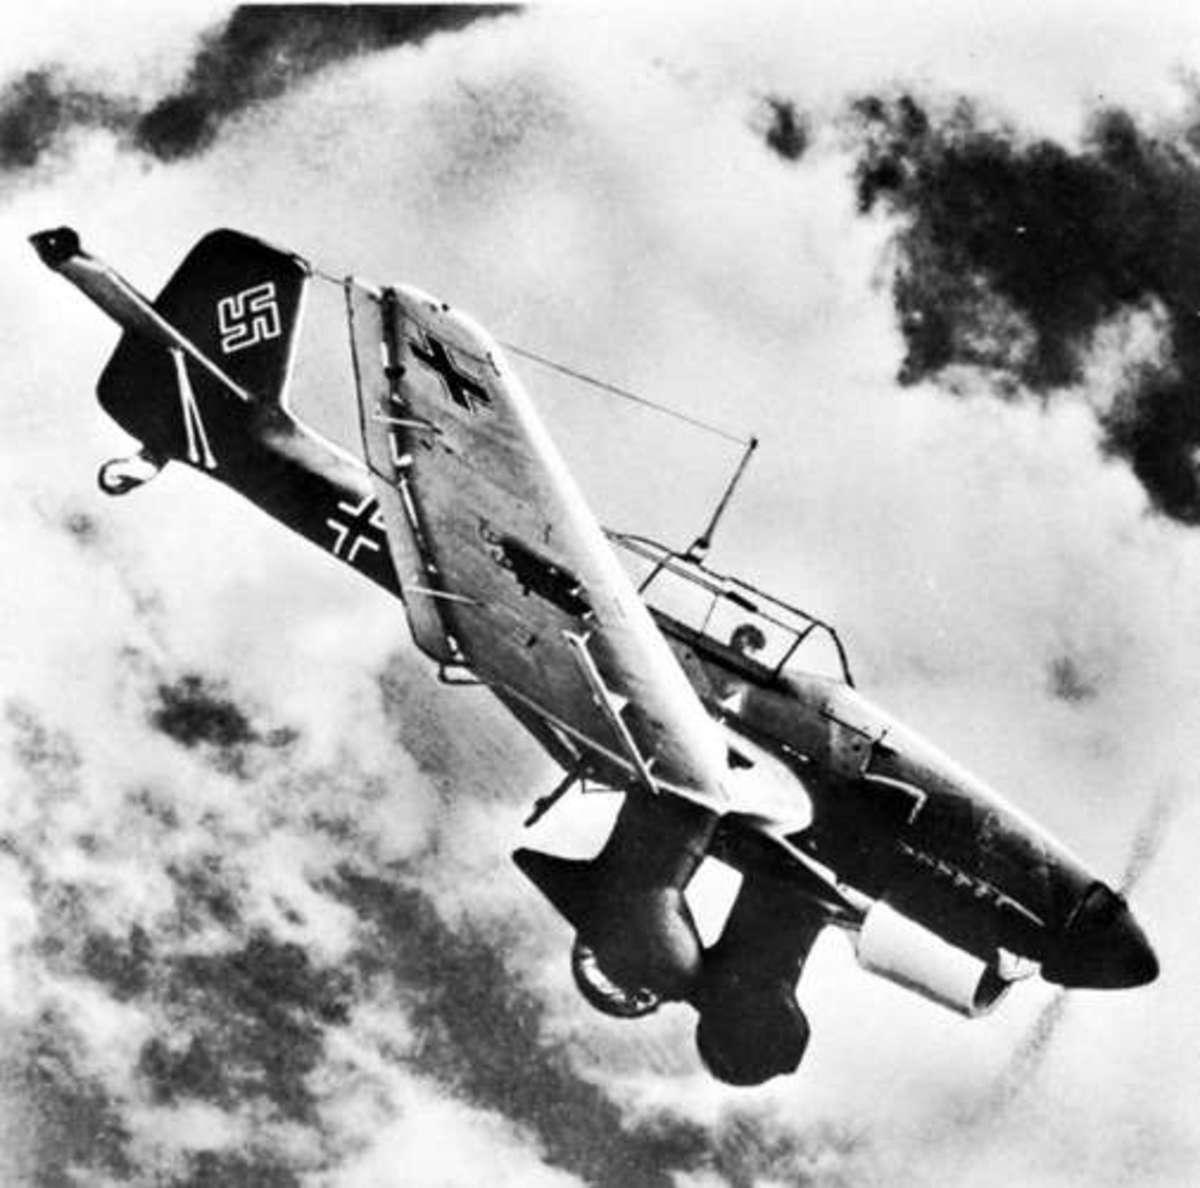 The Stuka Dive bomber